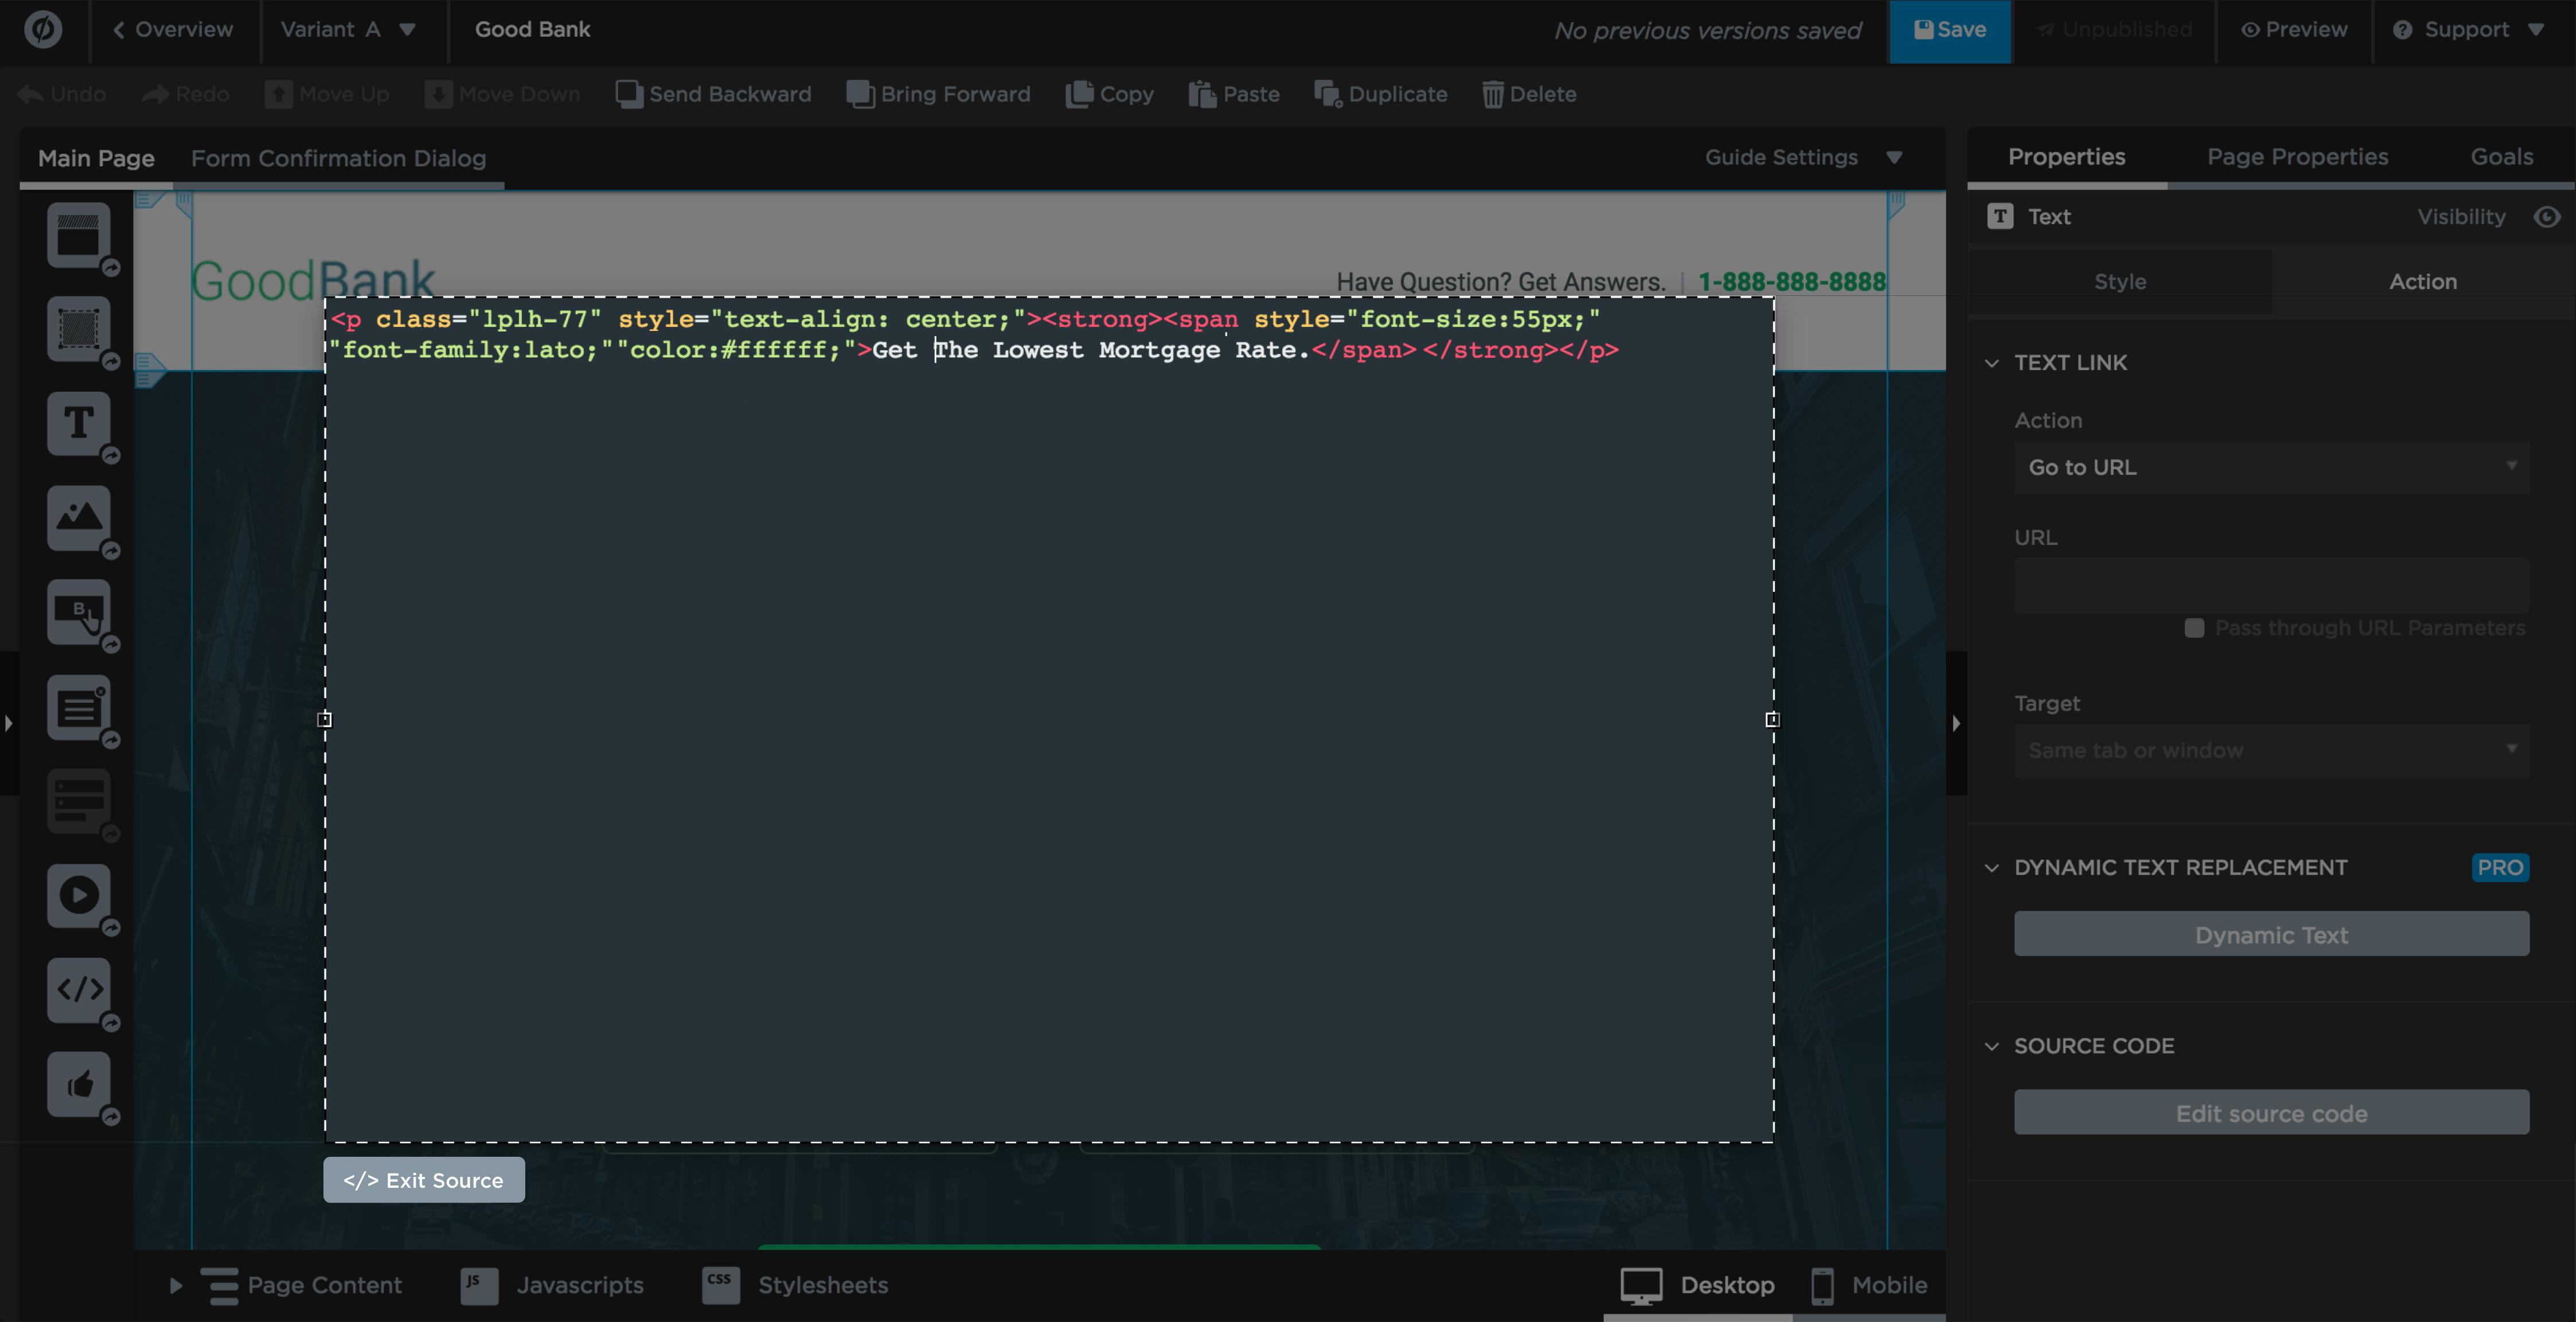 Source Mode Open